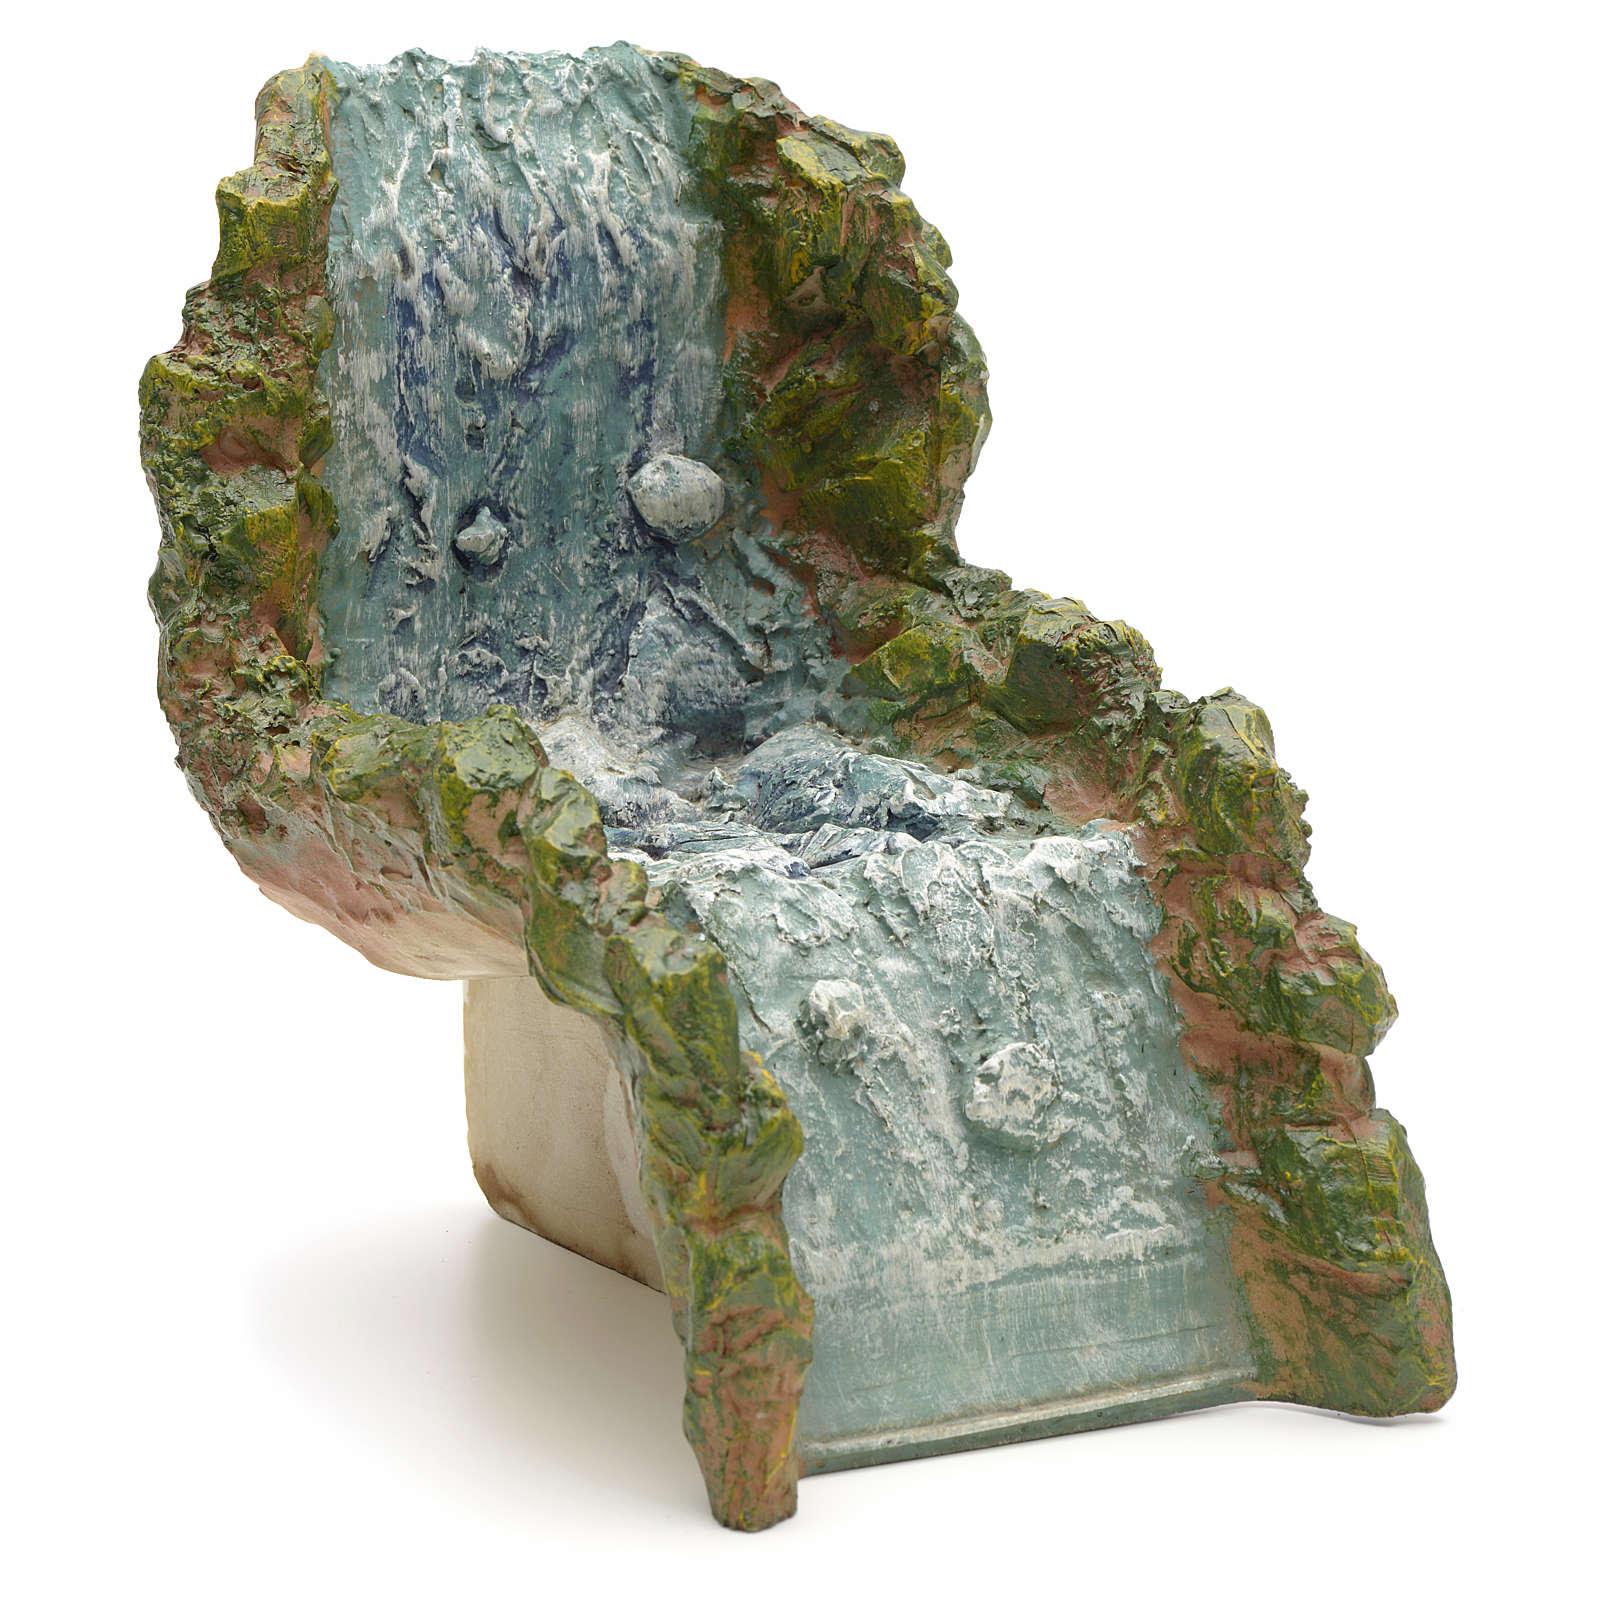 Nativity accessory, resin waterfall, water stream 4